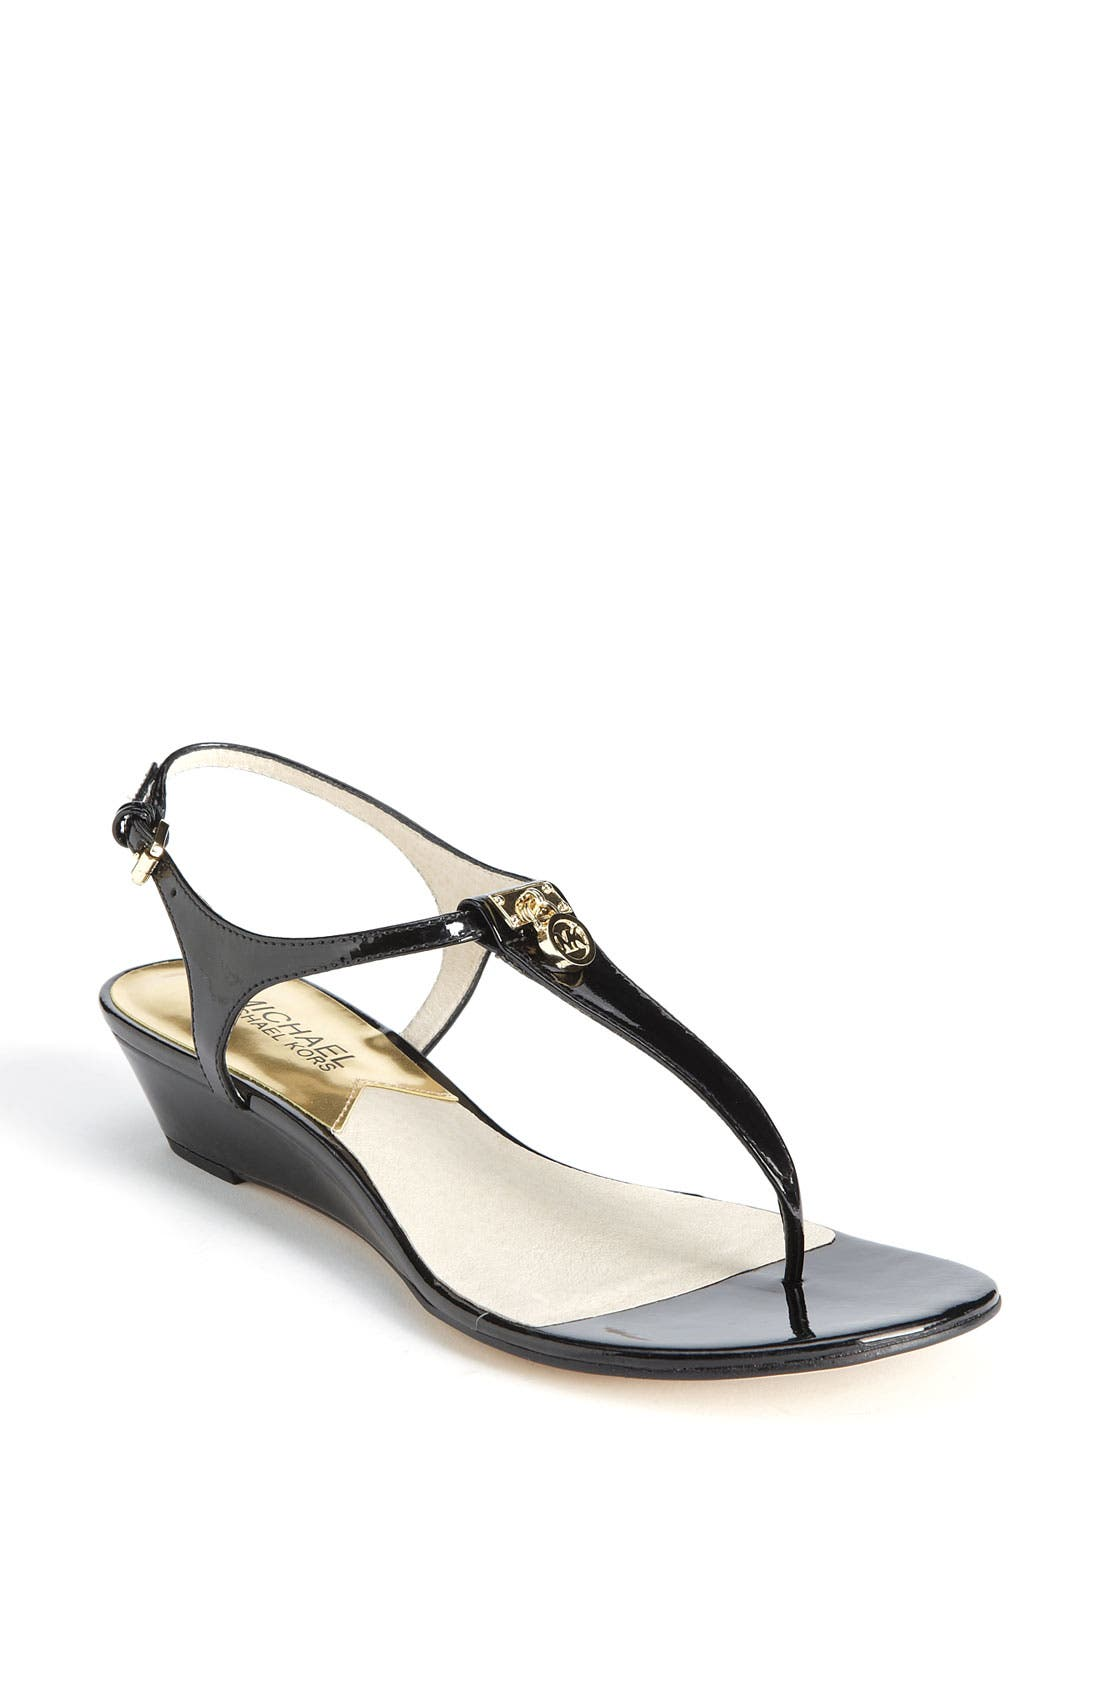 Main Image - MICHAEL Michael Kors 'Hamilton' Sandal